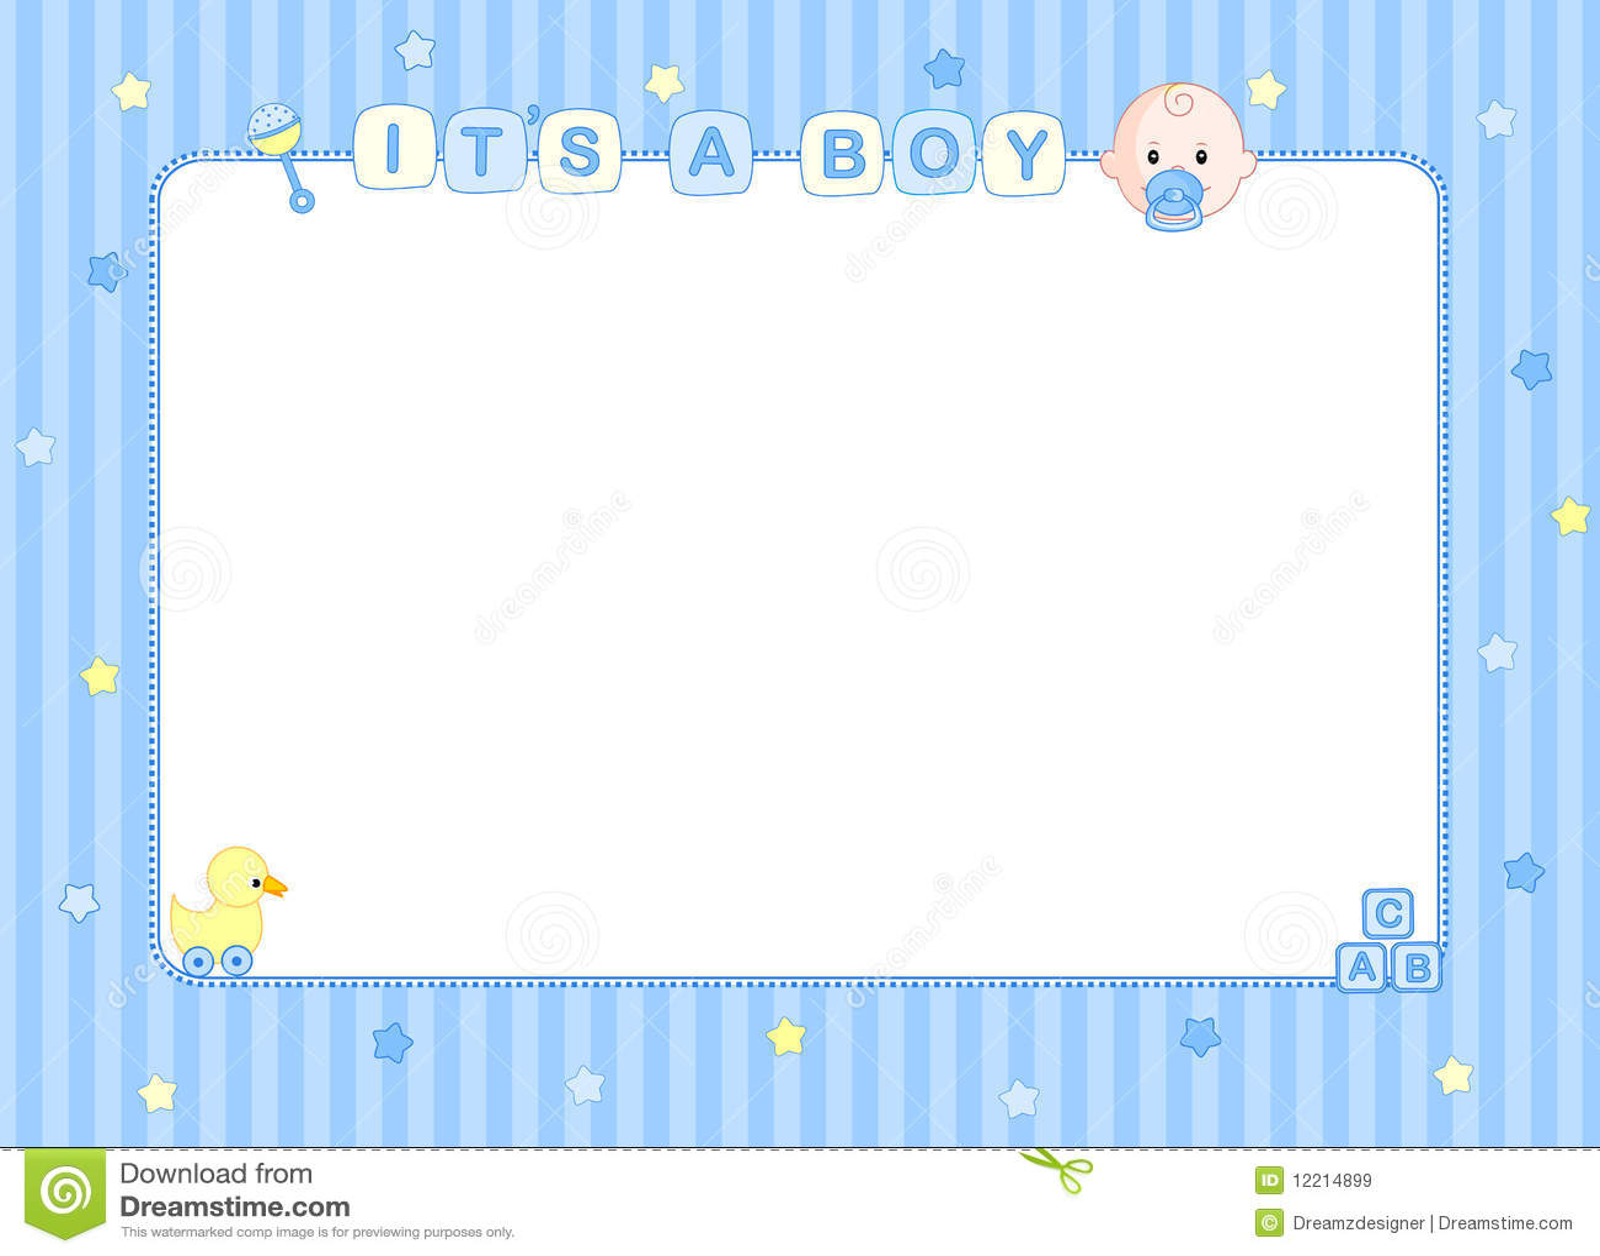 Baby Boy Arrival Card Border Stock Vector - Illustration